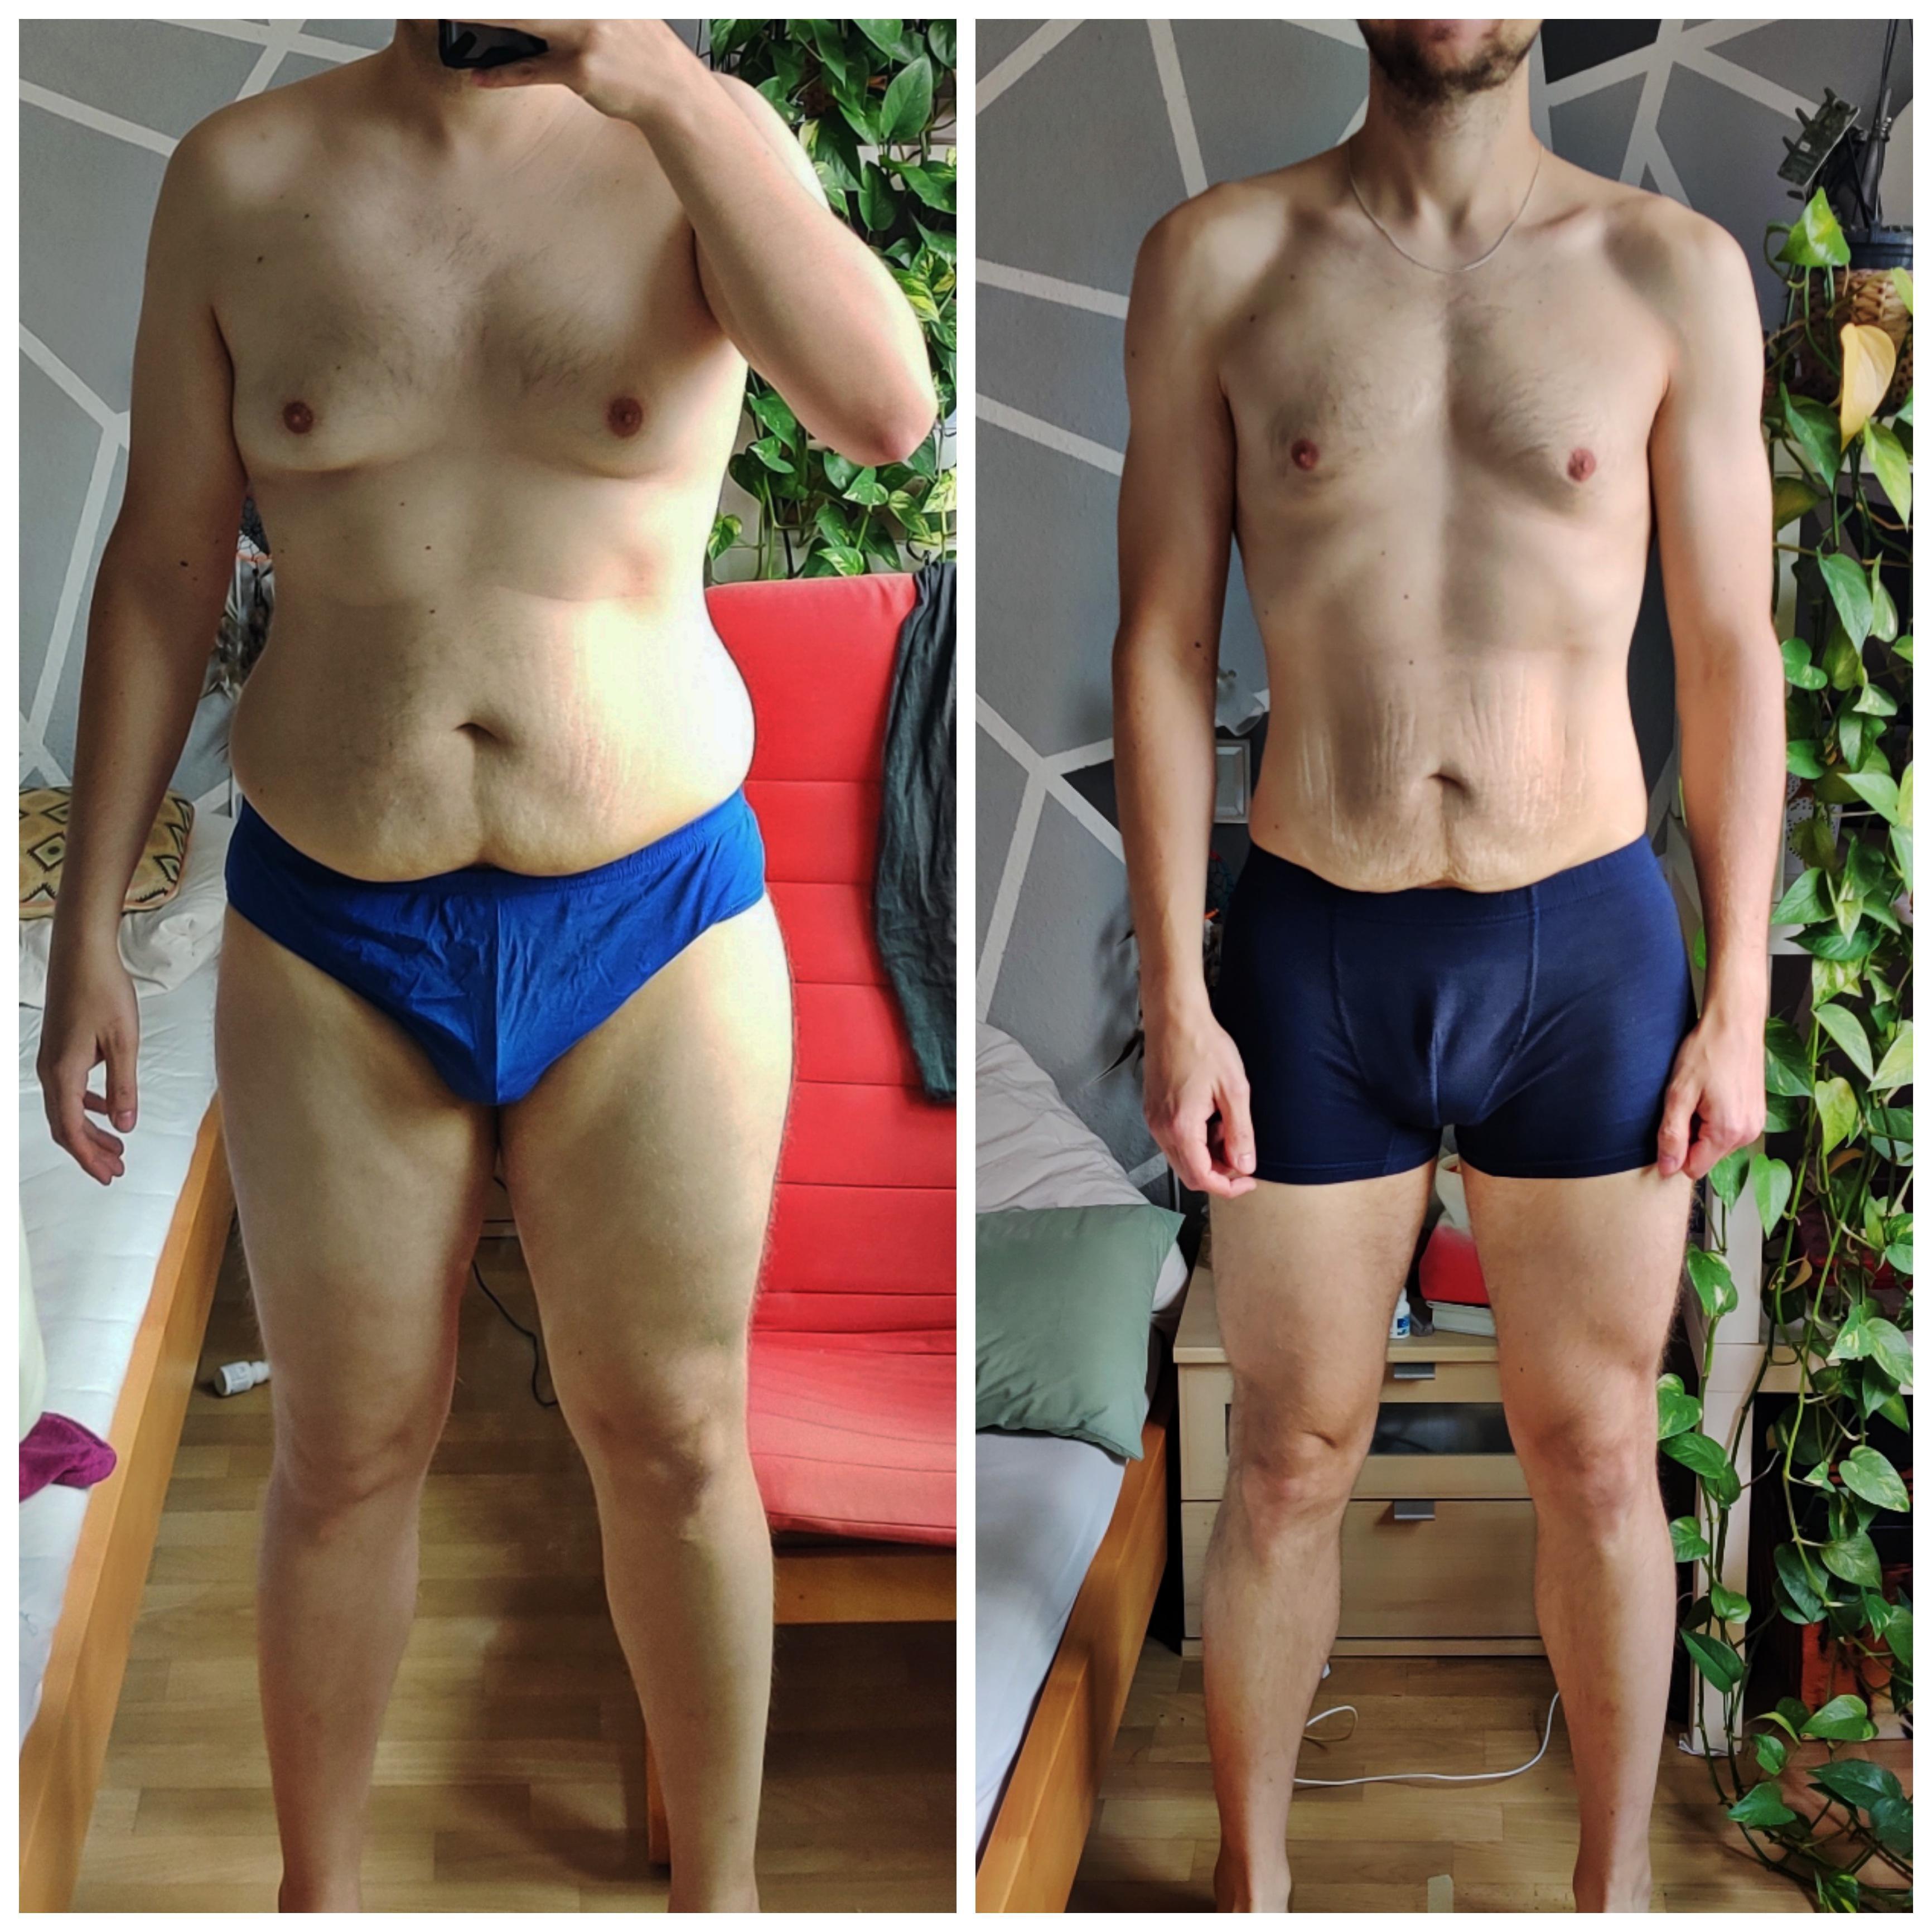 5'11 Male 48 lbs Weight Loss 216 lbs to 168 lbs